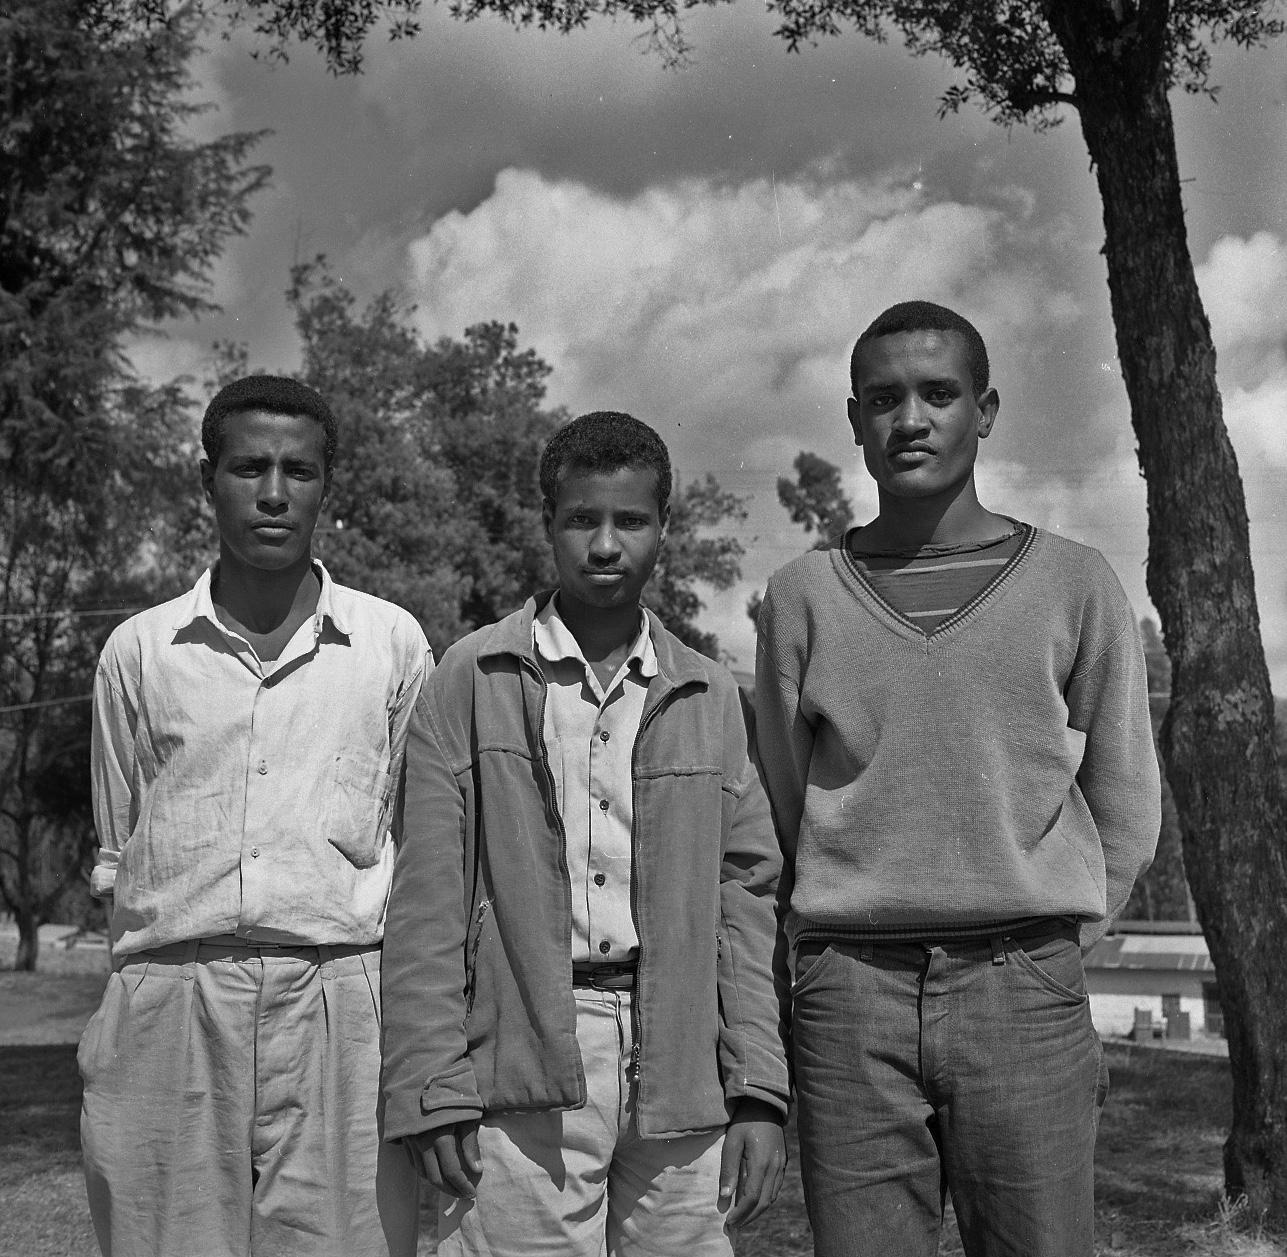 TMS-Students-Photo-2-taken-1963-1965_1